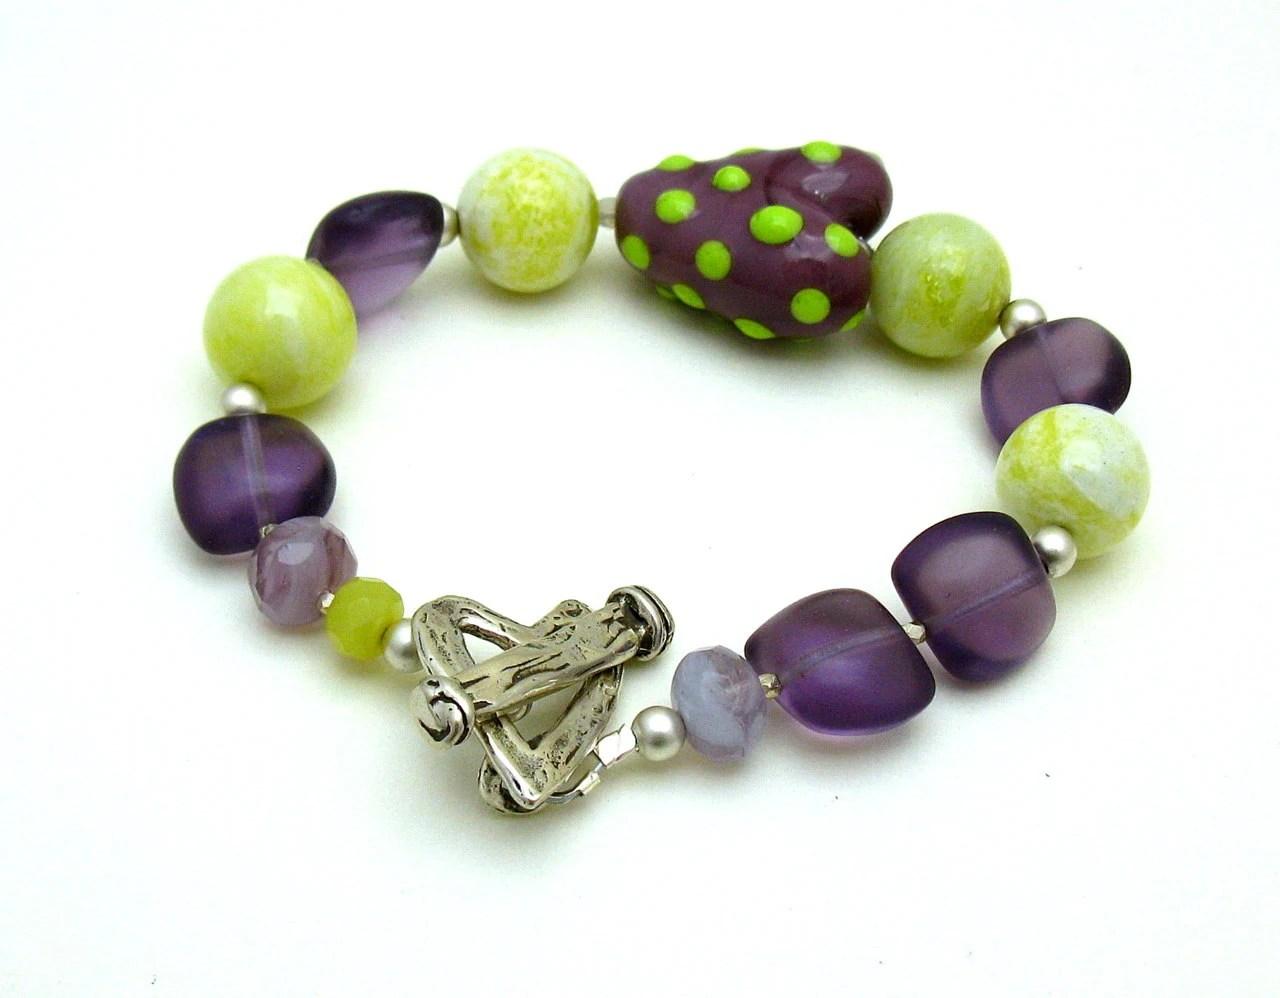 Purple Lime Heart Eclectic Lampwork Bracelet - Heartfelt / Love / Heart / Romance / Valentine - cooljewelrydesign